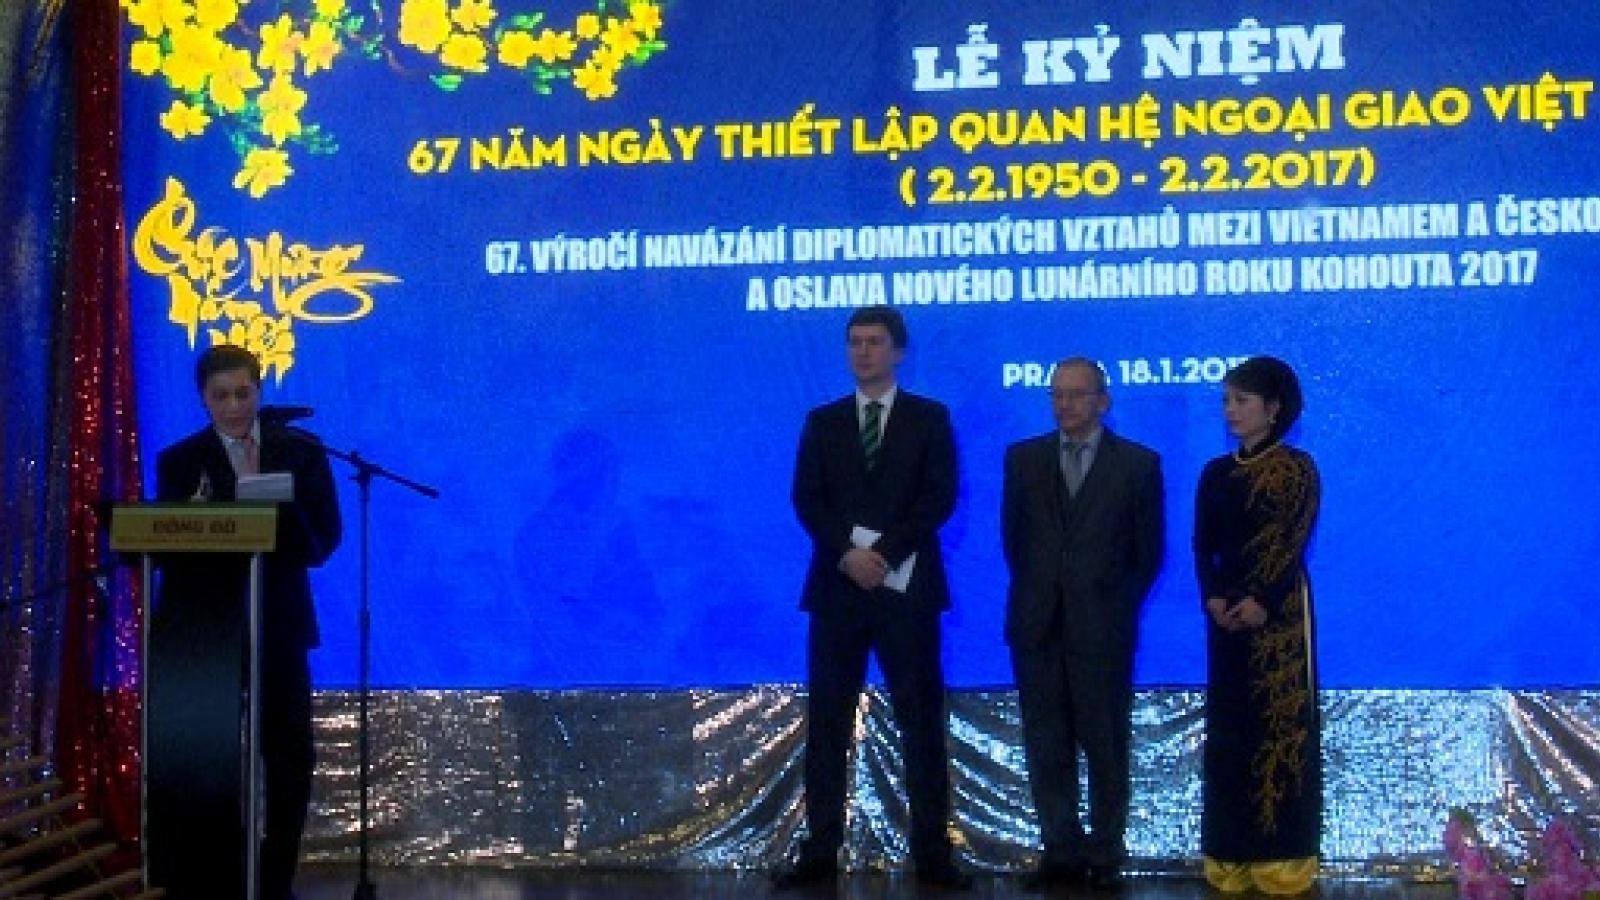 Ceremony marks Vietnam-Czech diplomatic ties